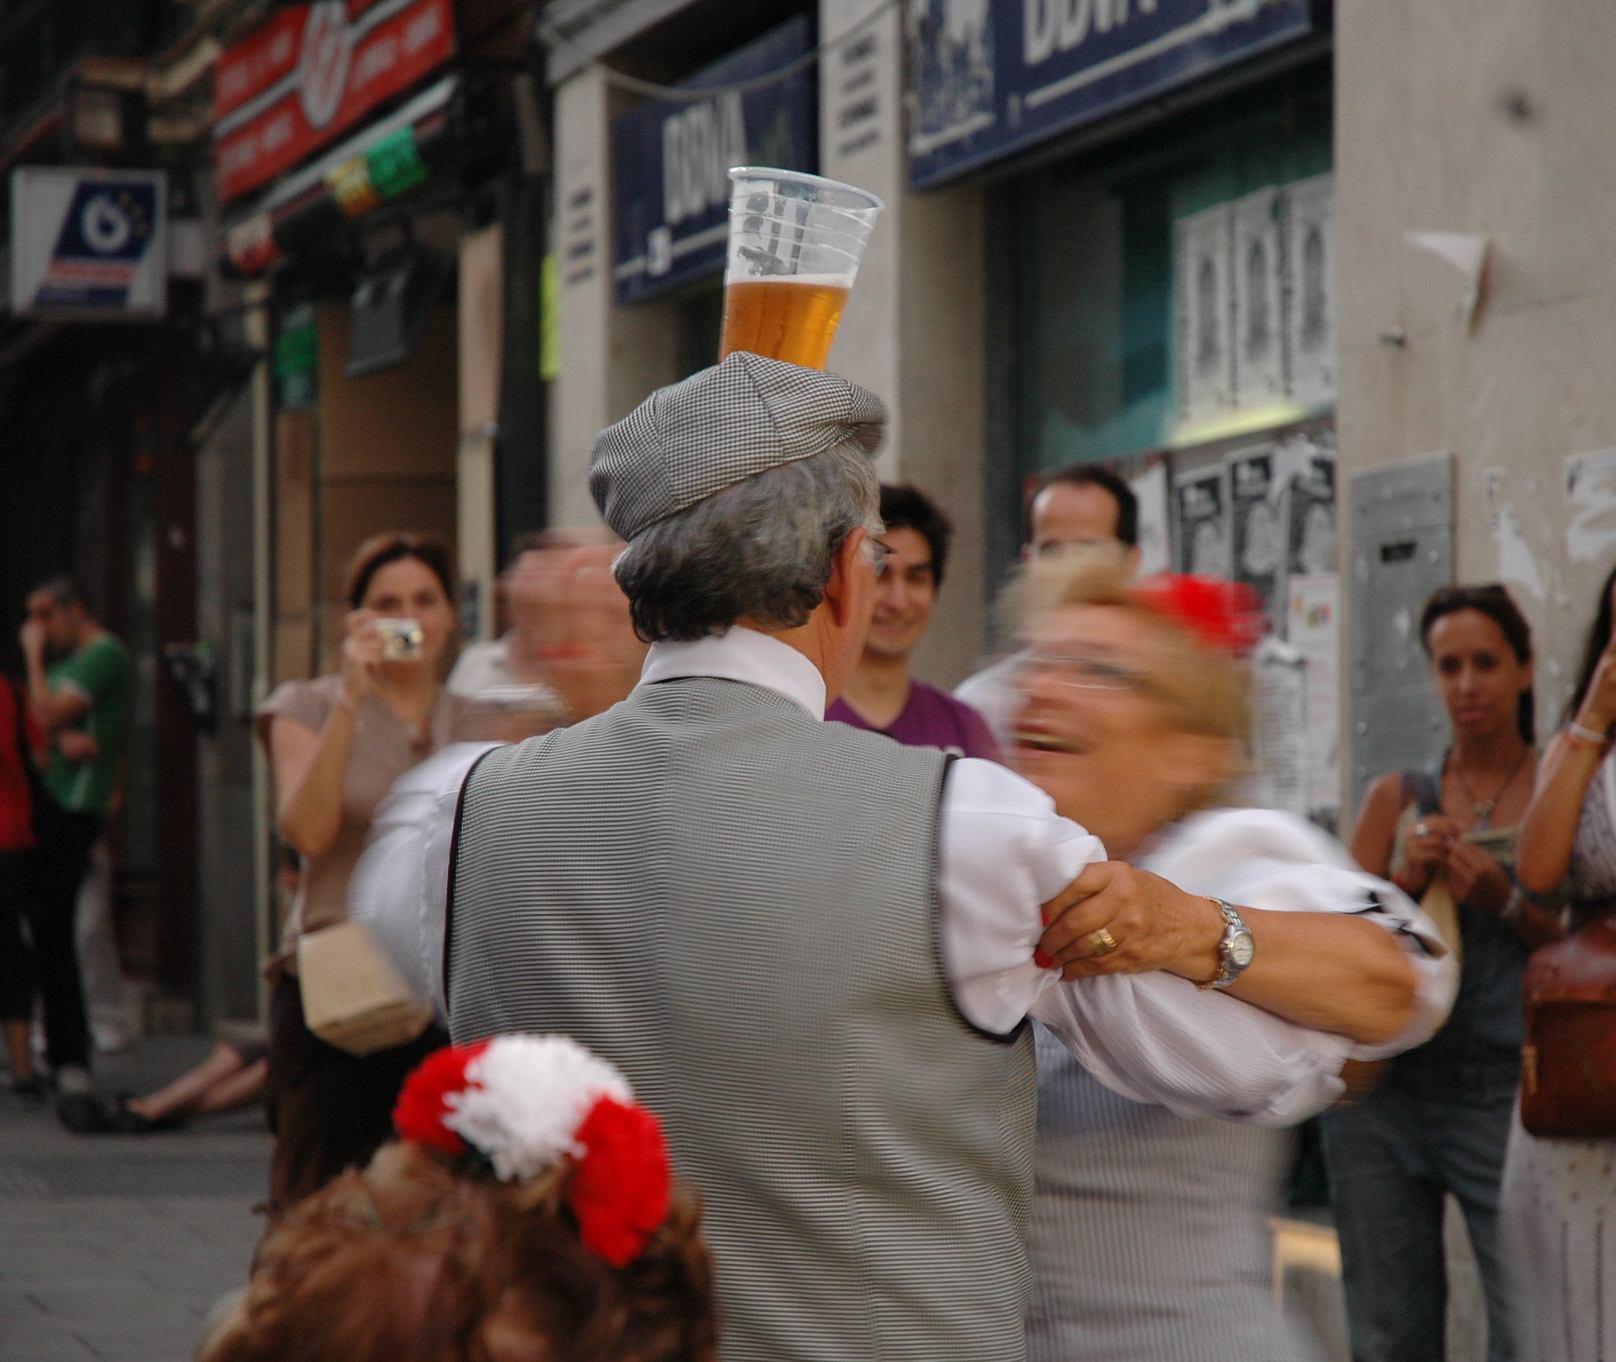 Lavapies in Madrid by Mick Amrock